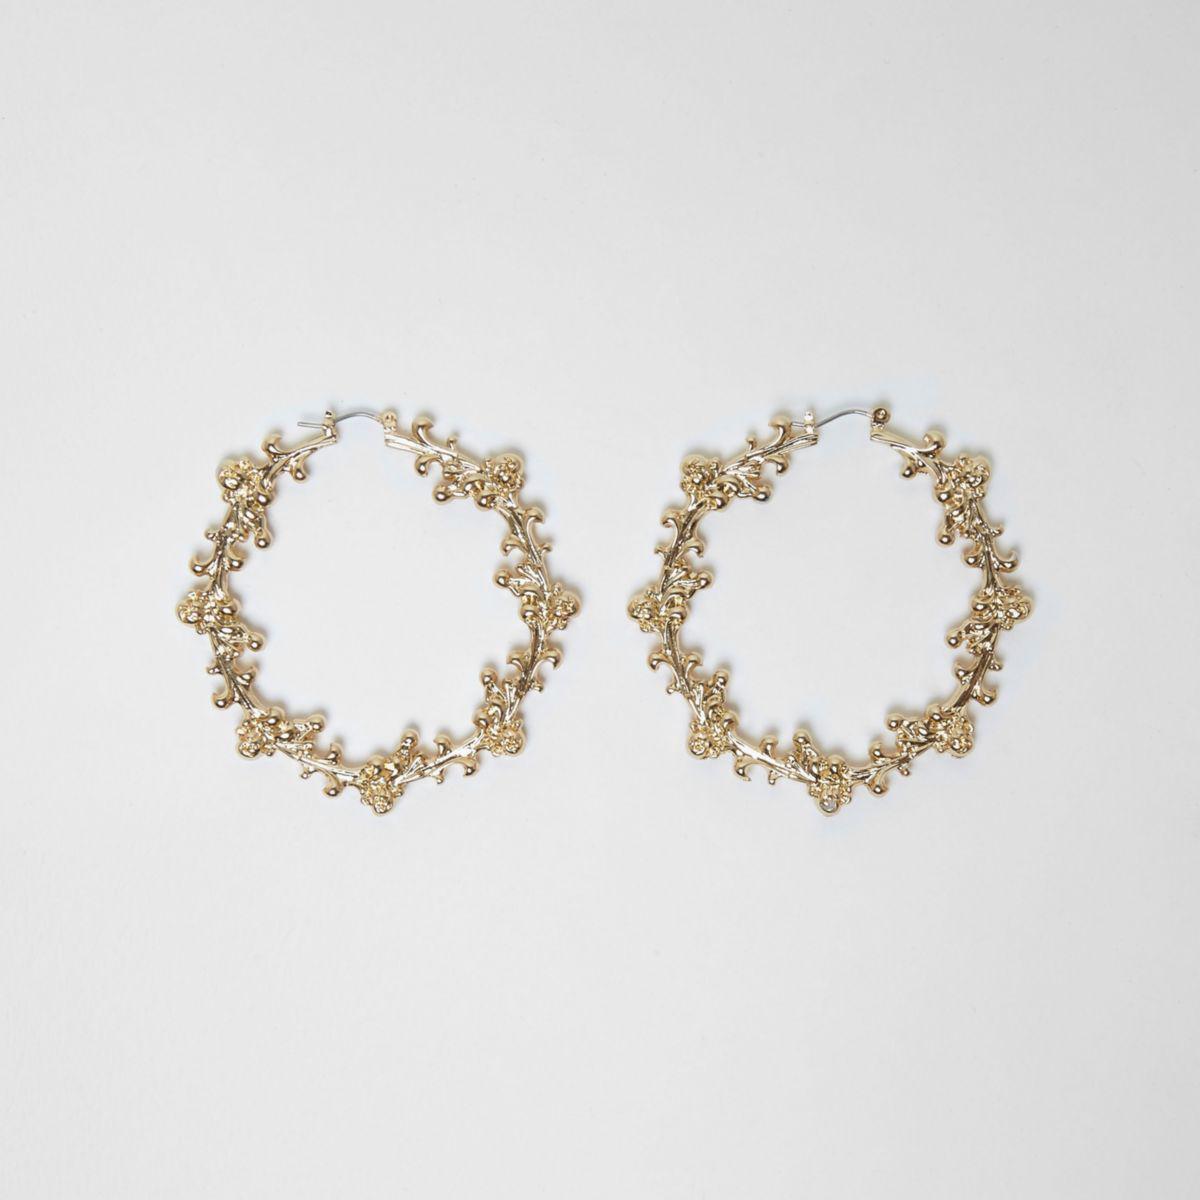 River island Gold Tone Ornate Embellished Hoop Earrings in ...